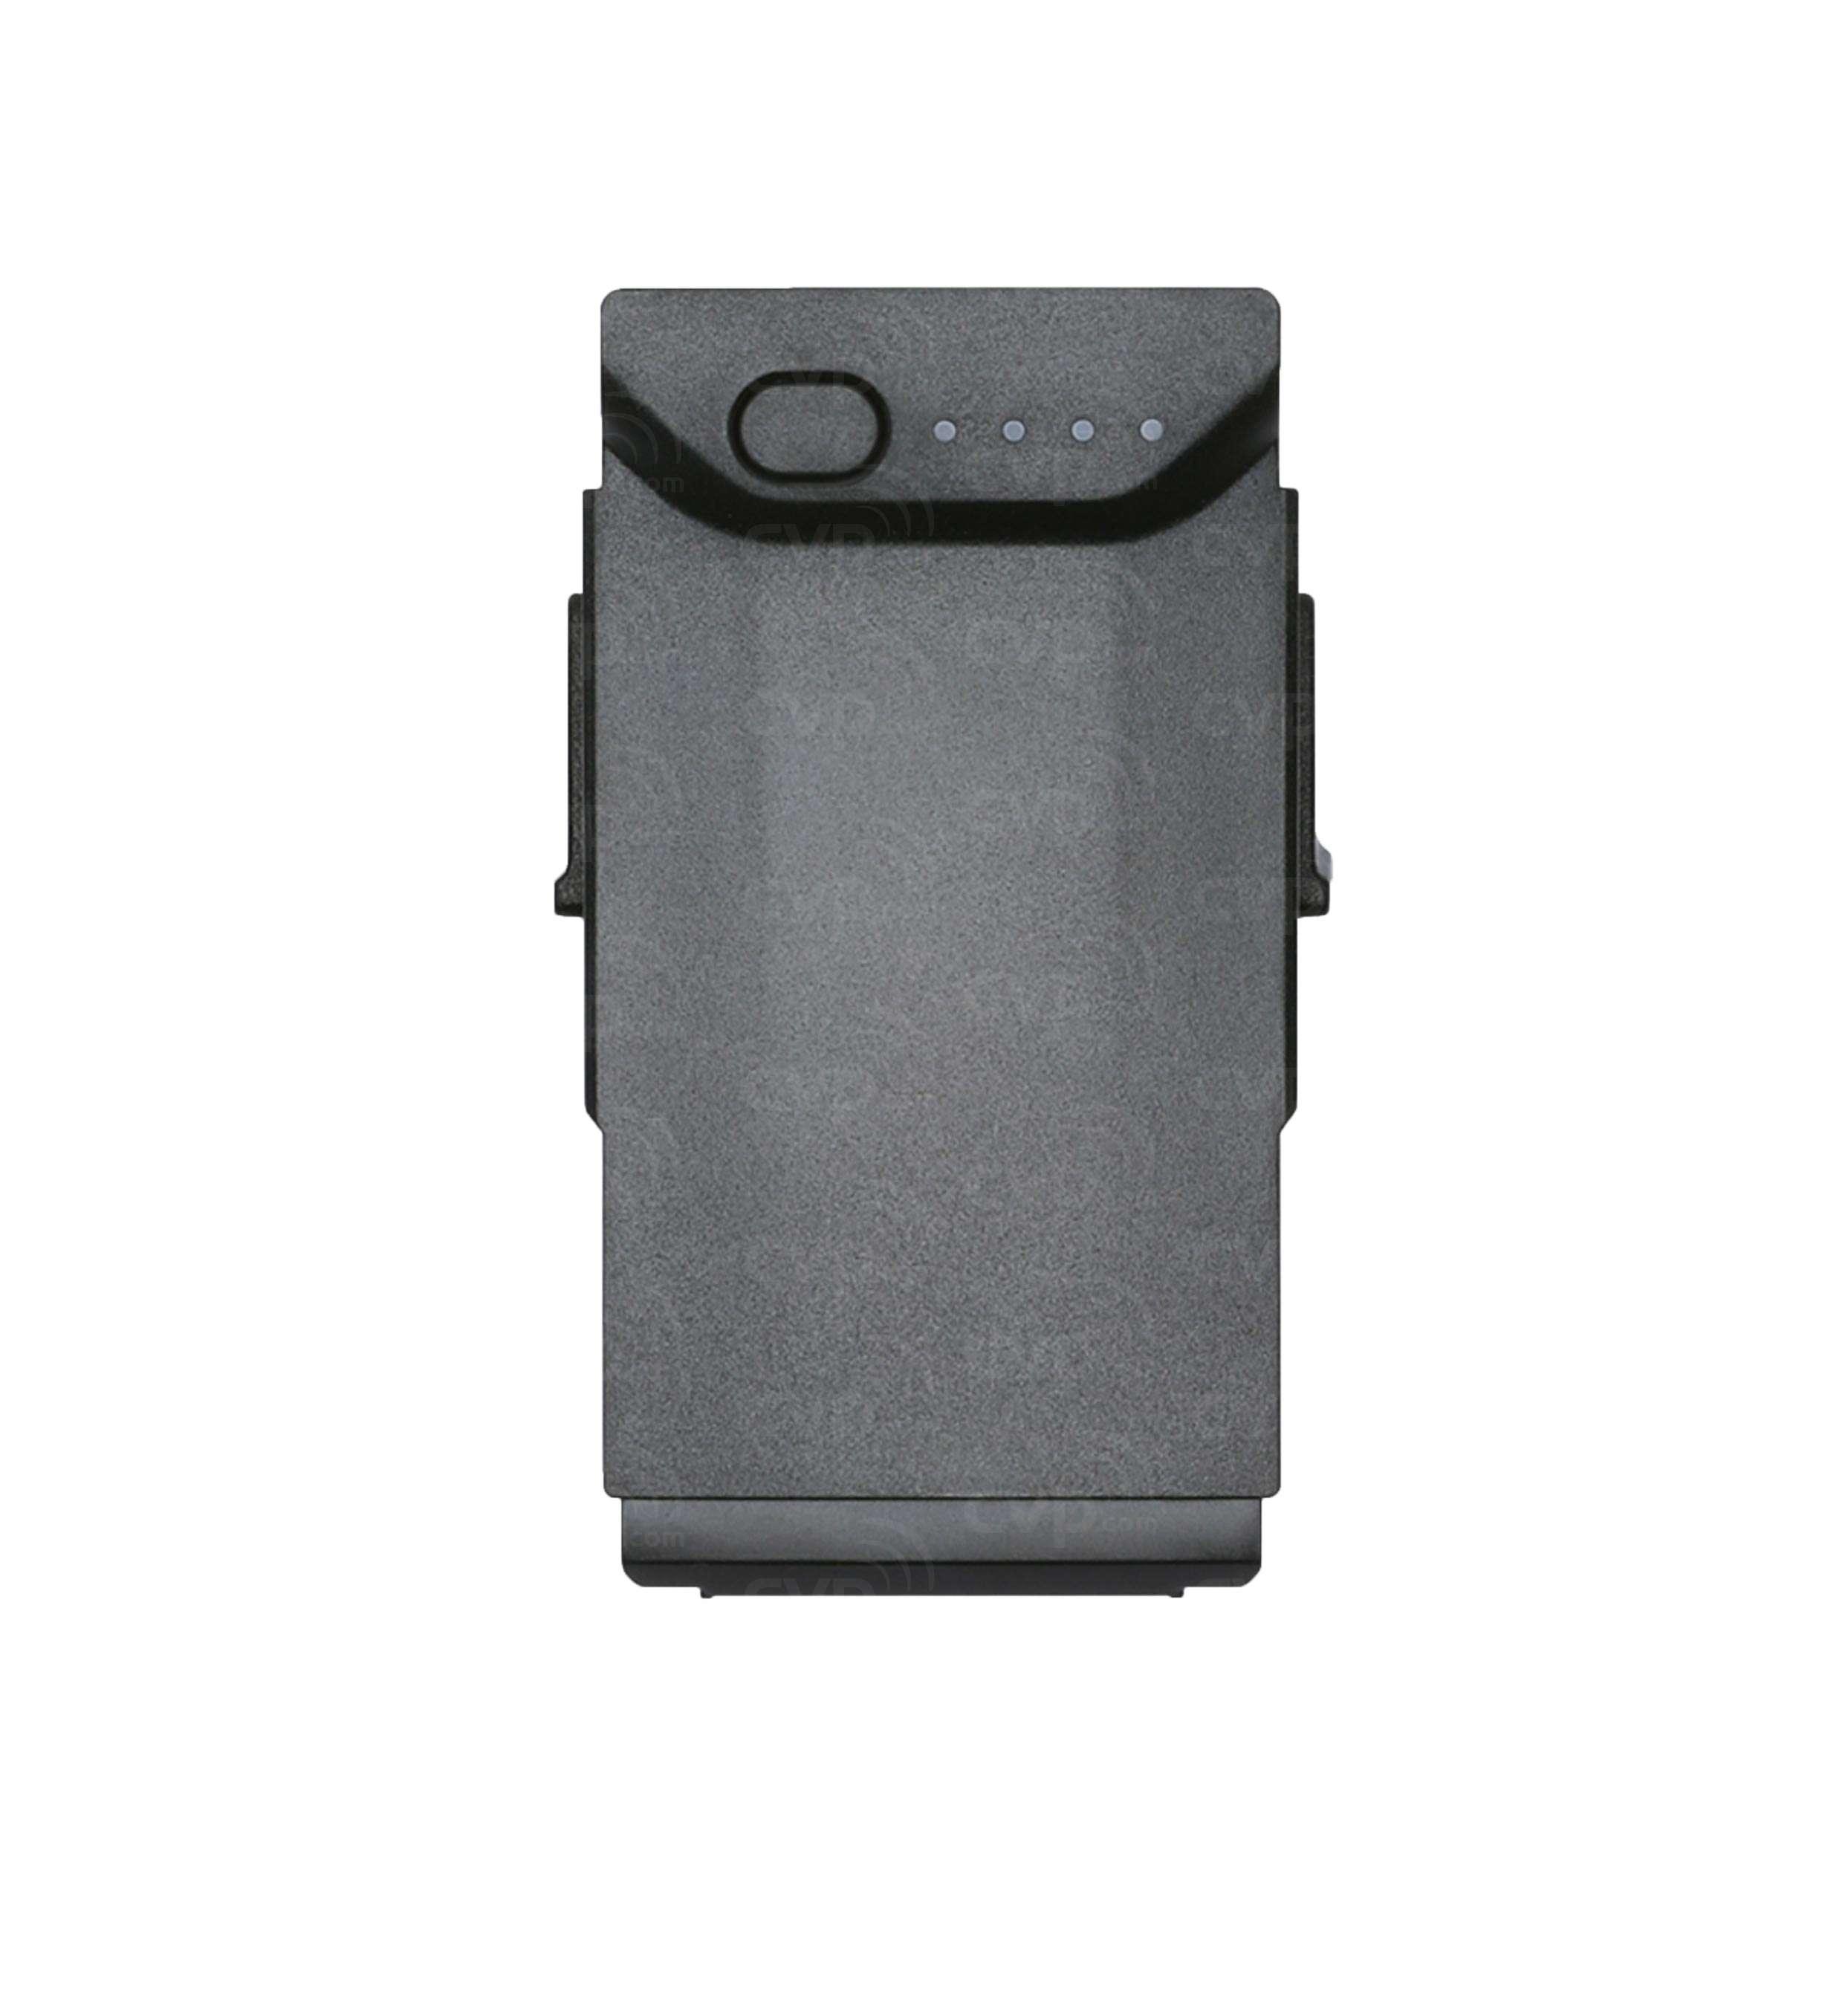 Найти сменный аккумулятор mavic air фильтр нд64 мавик polar (полароид)